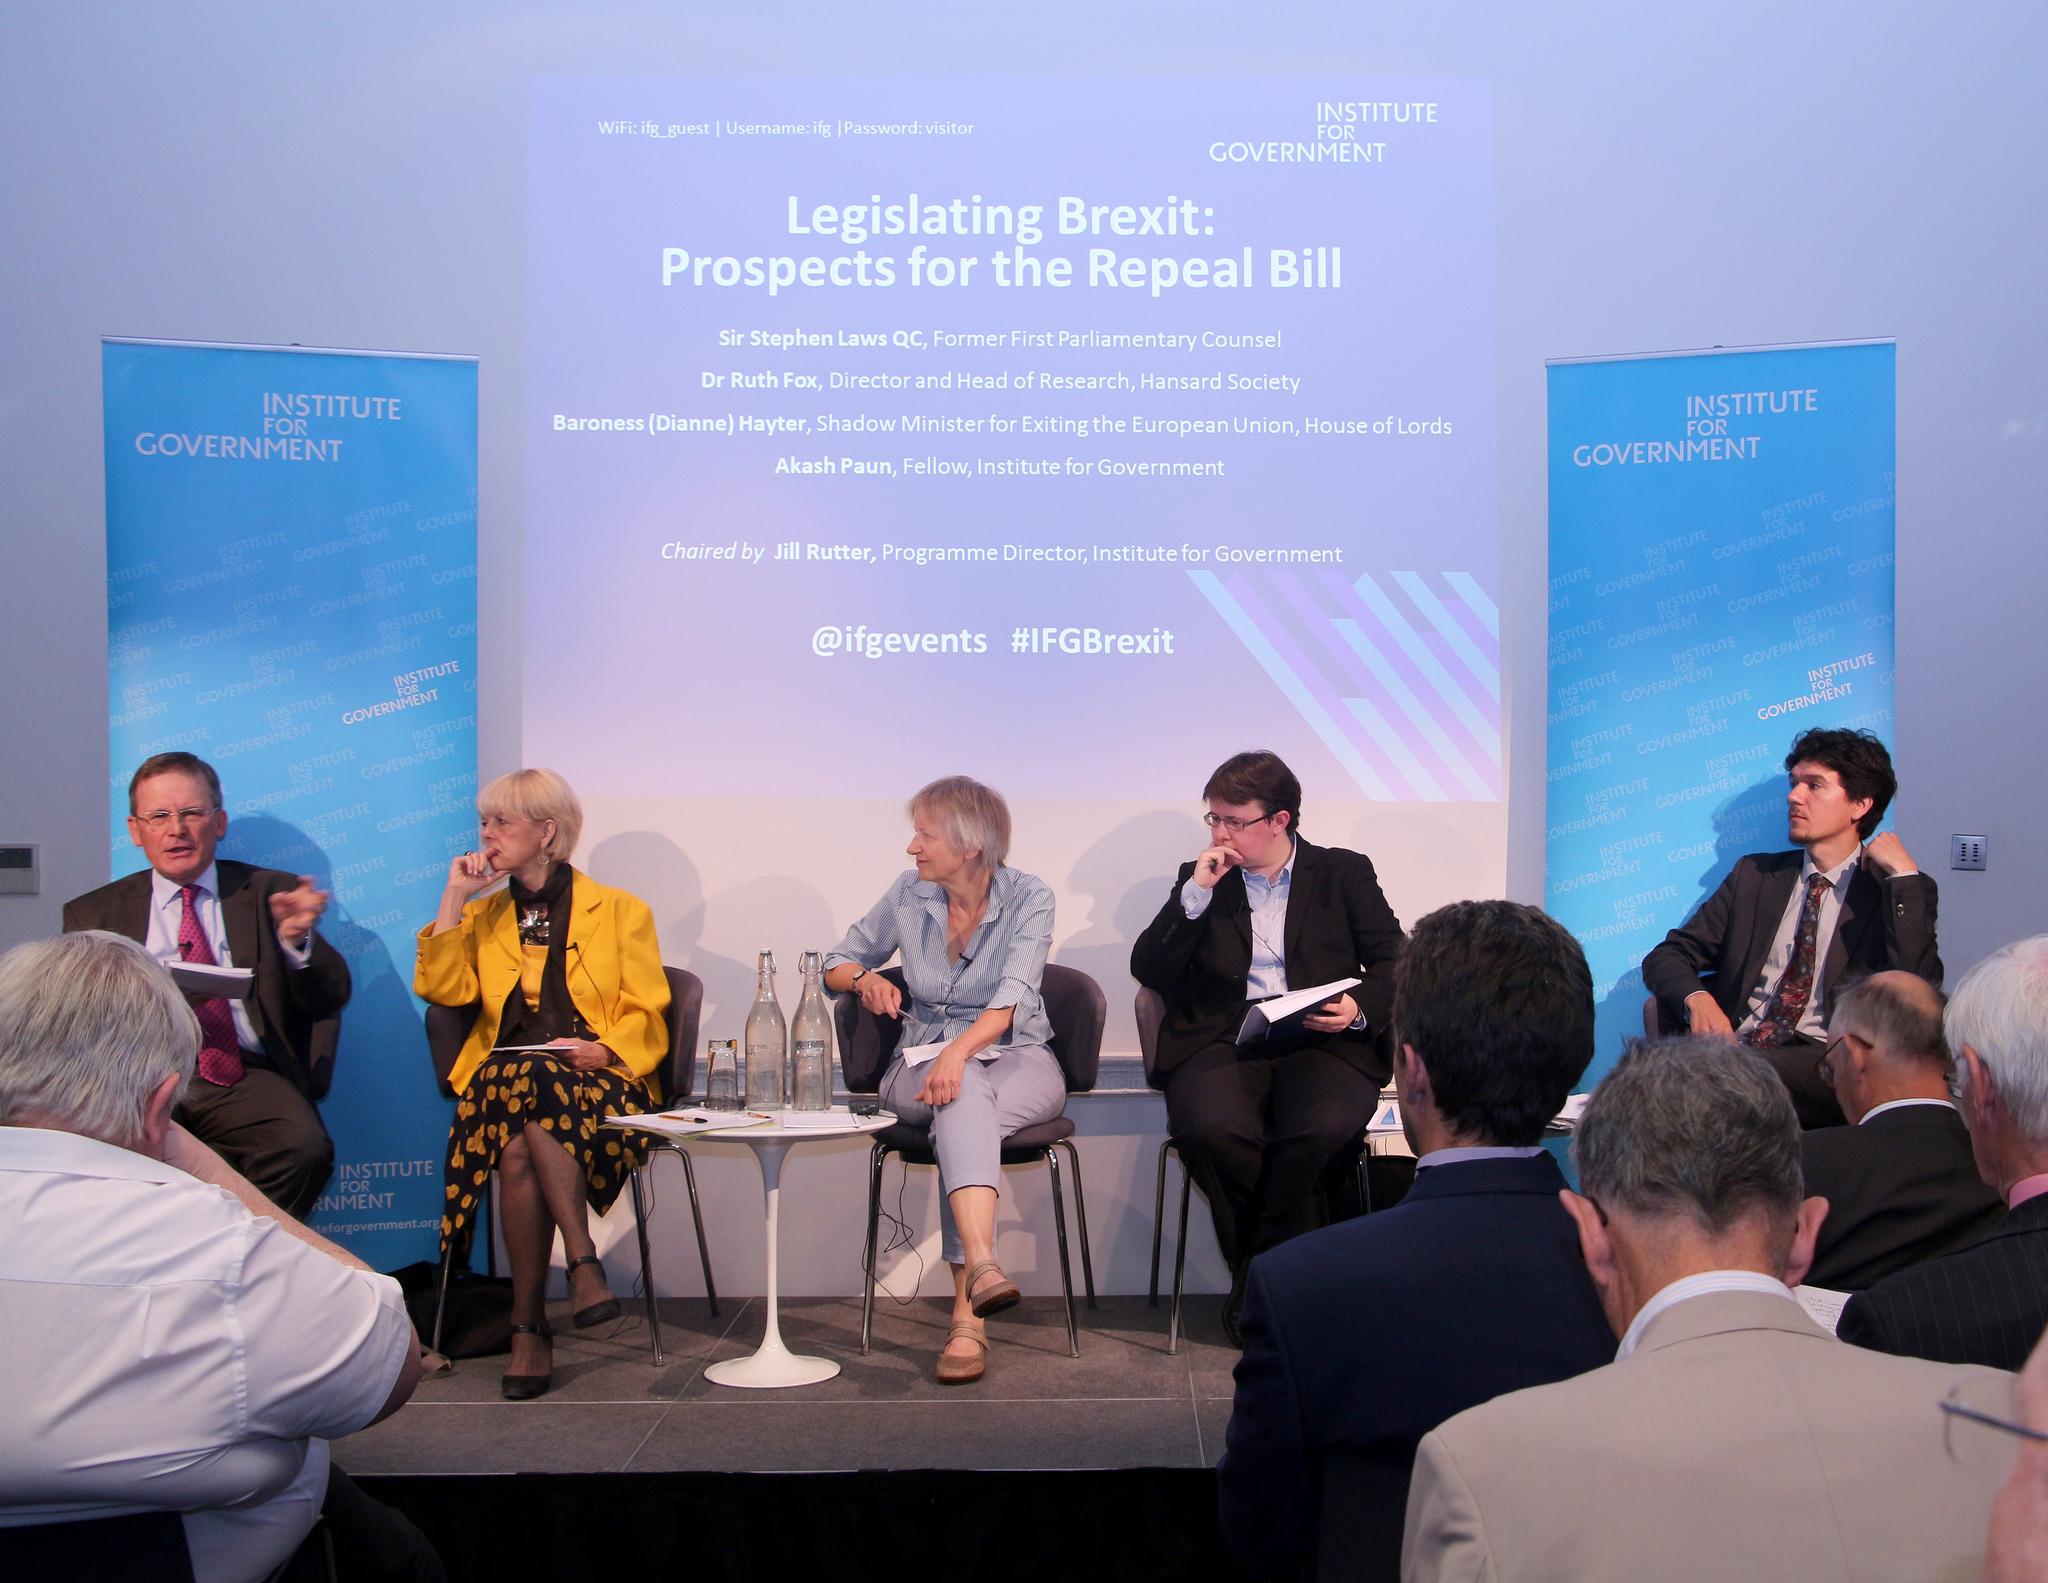 Panellists:  Baroness Hayter, Sir Stephen Laws QC, Dr Ruth Fox and Akash Paun